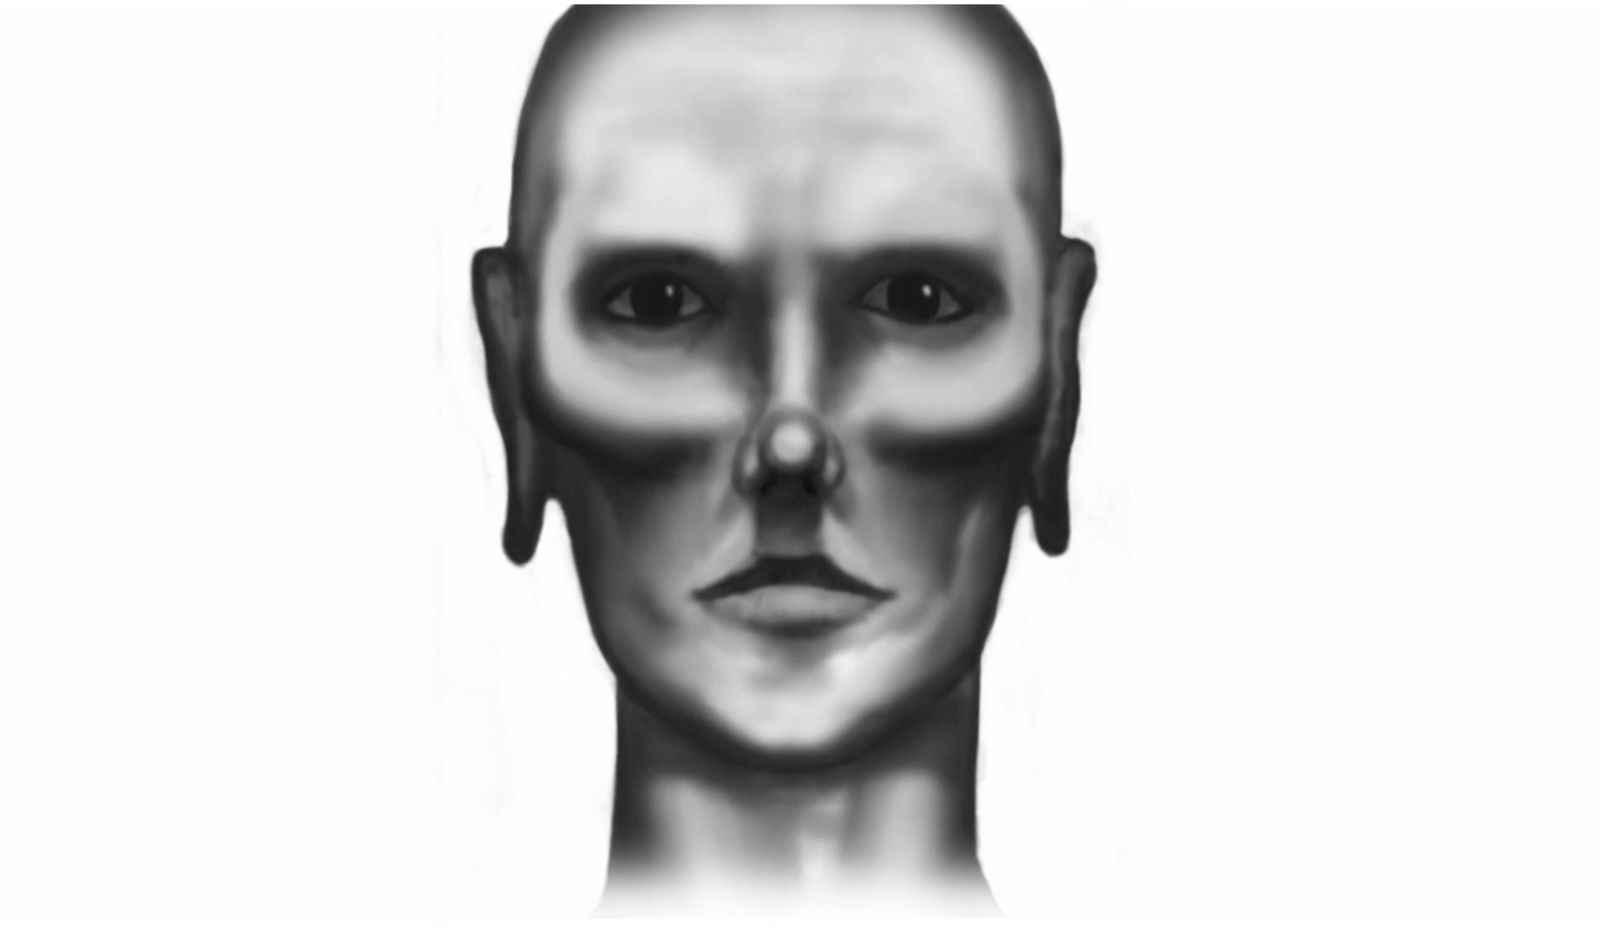 12_face_of_sentinel.jpg